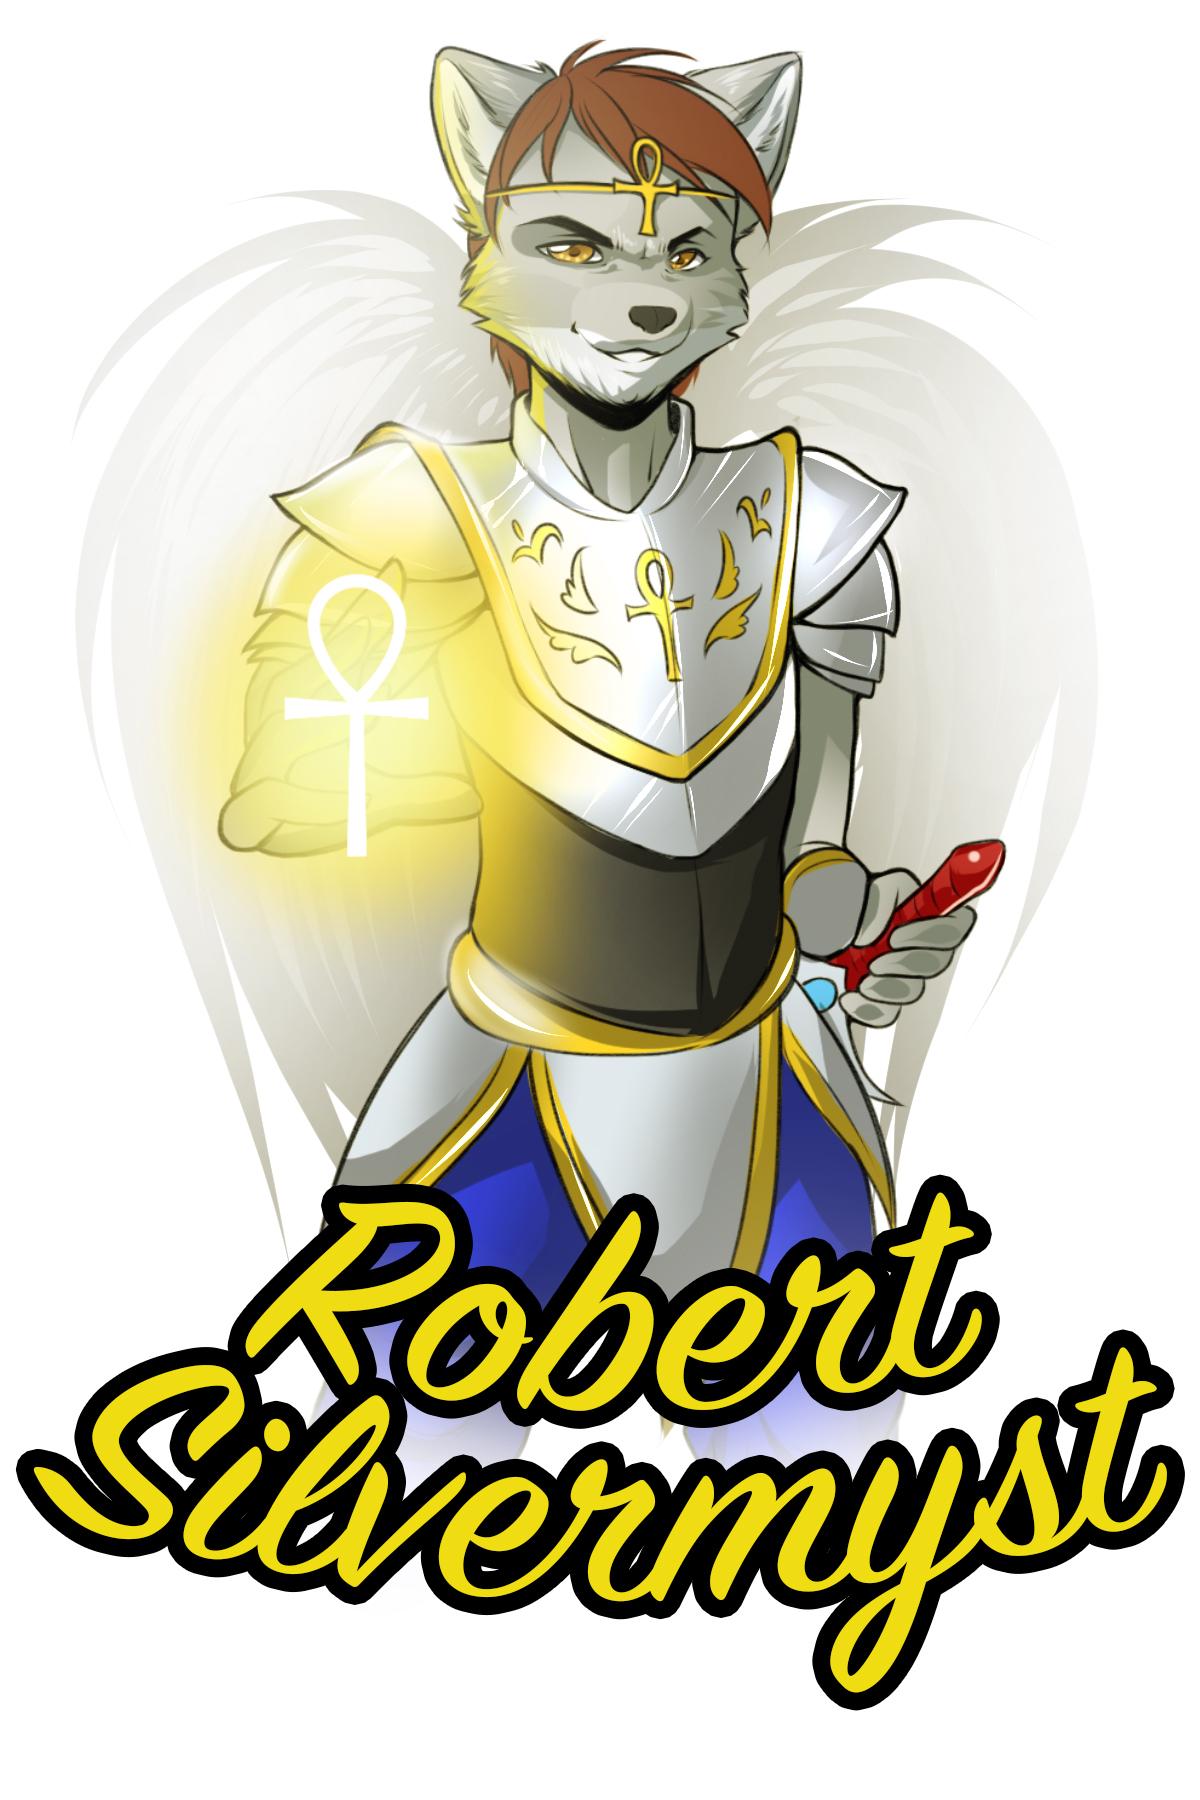 Robert Silvermyst's Fursona Avatar